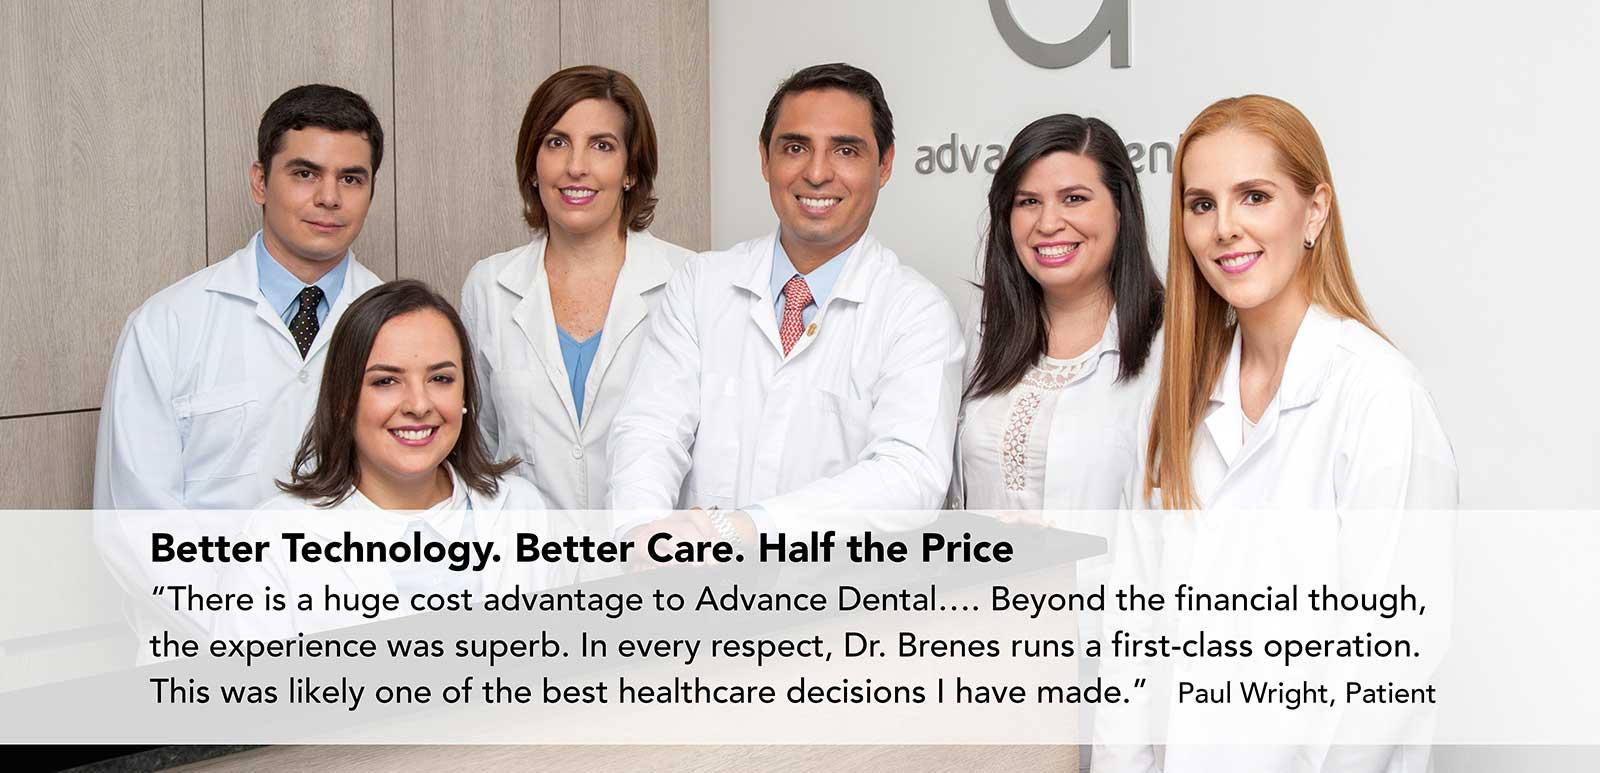 Advance Dental Clinic Costa Rica - Patient Testimonial